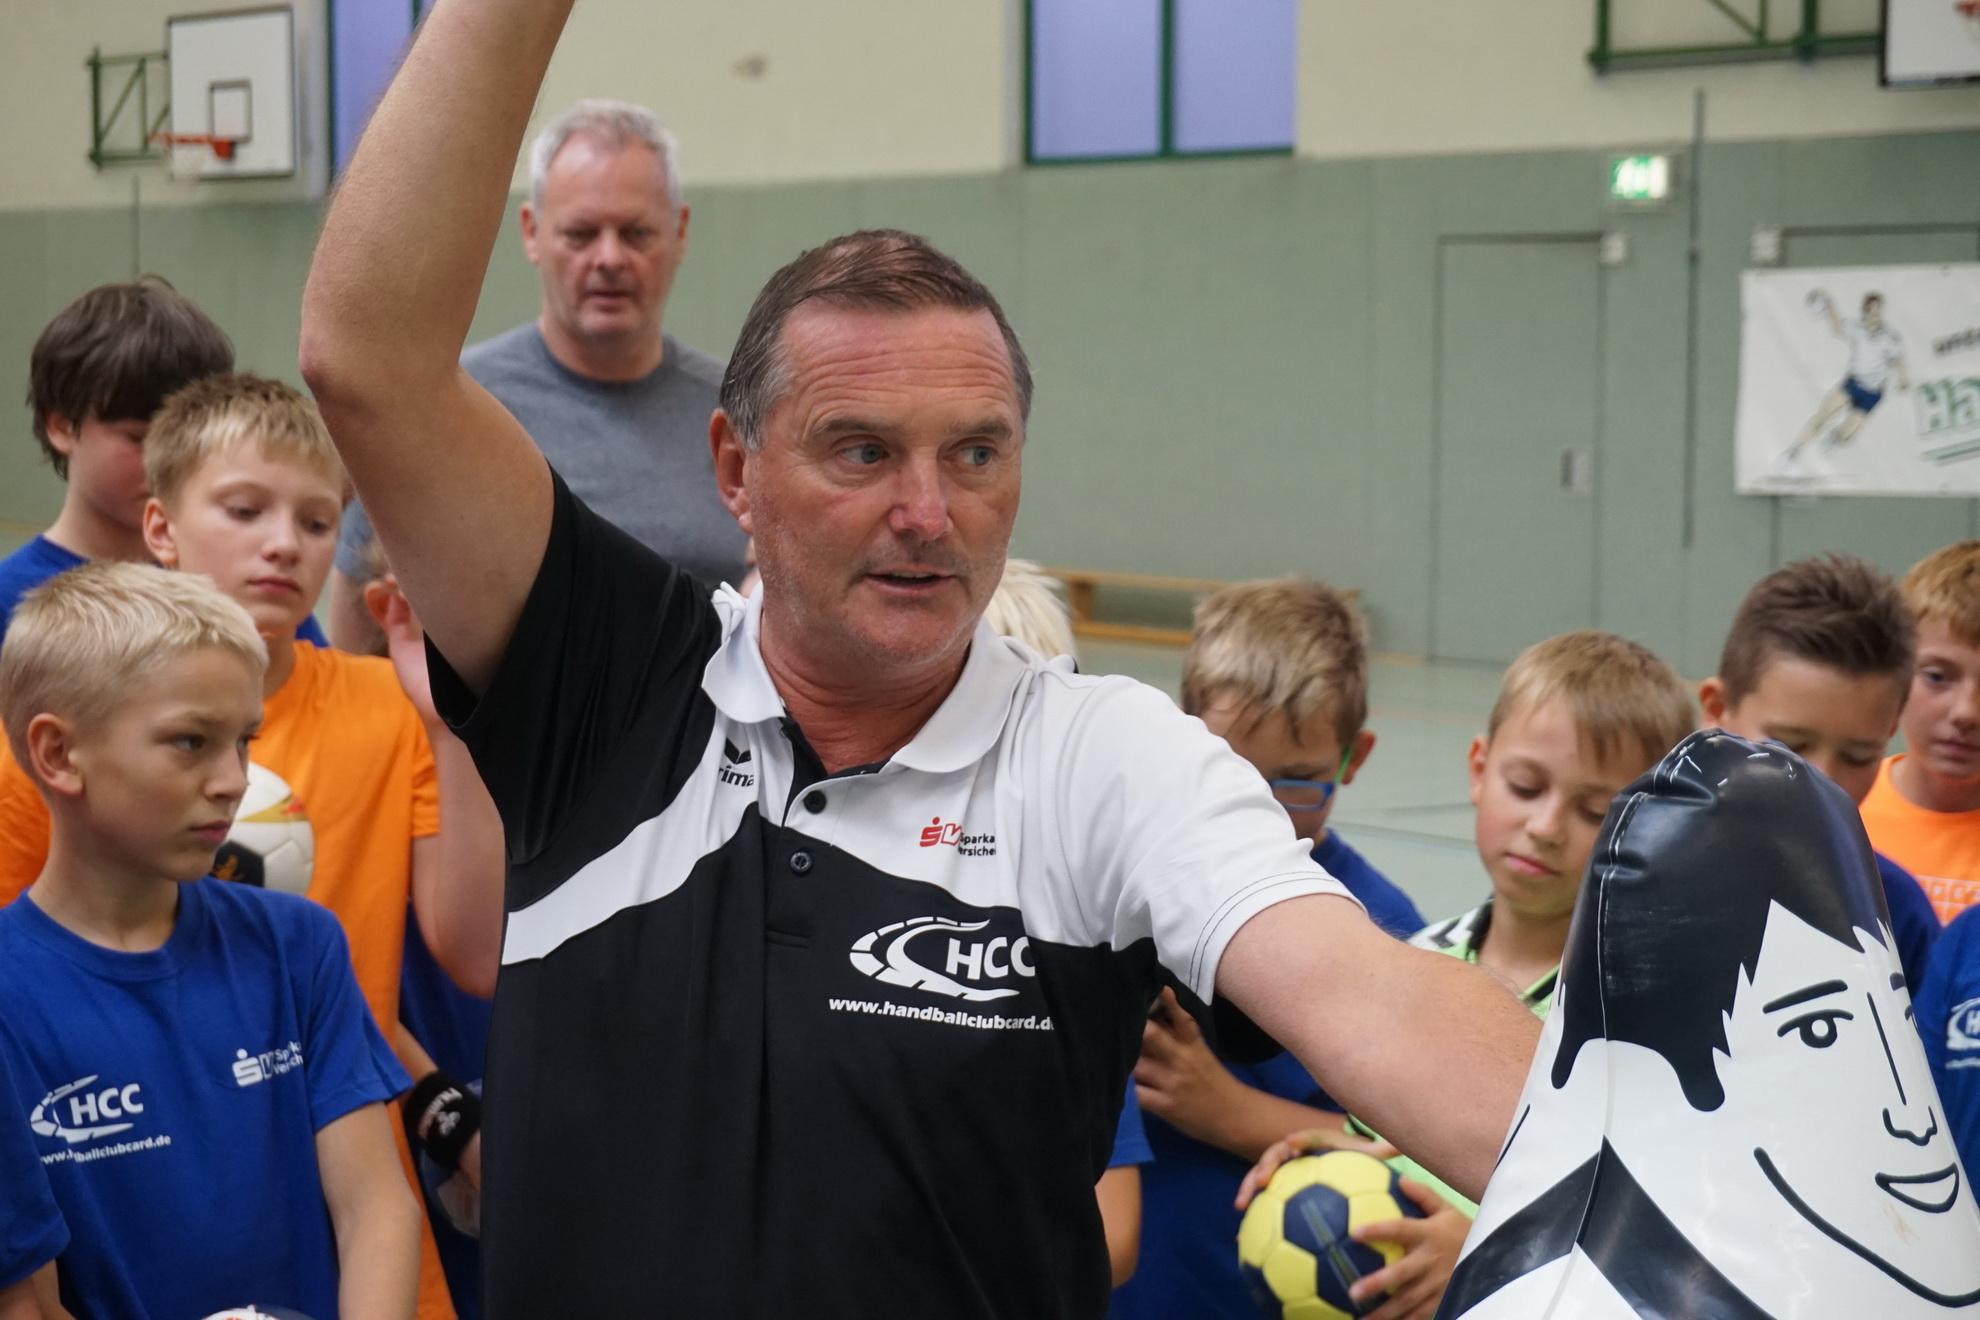 201808_Handballcamp_SDH_MG_198w